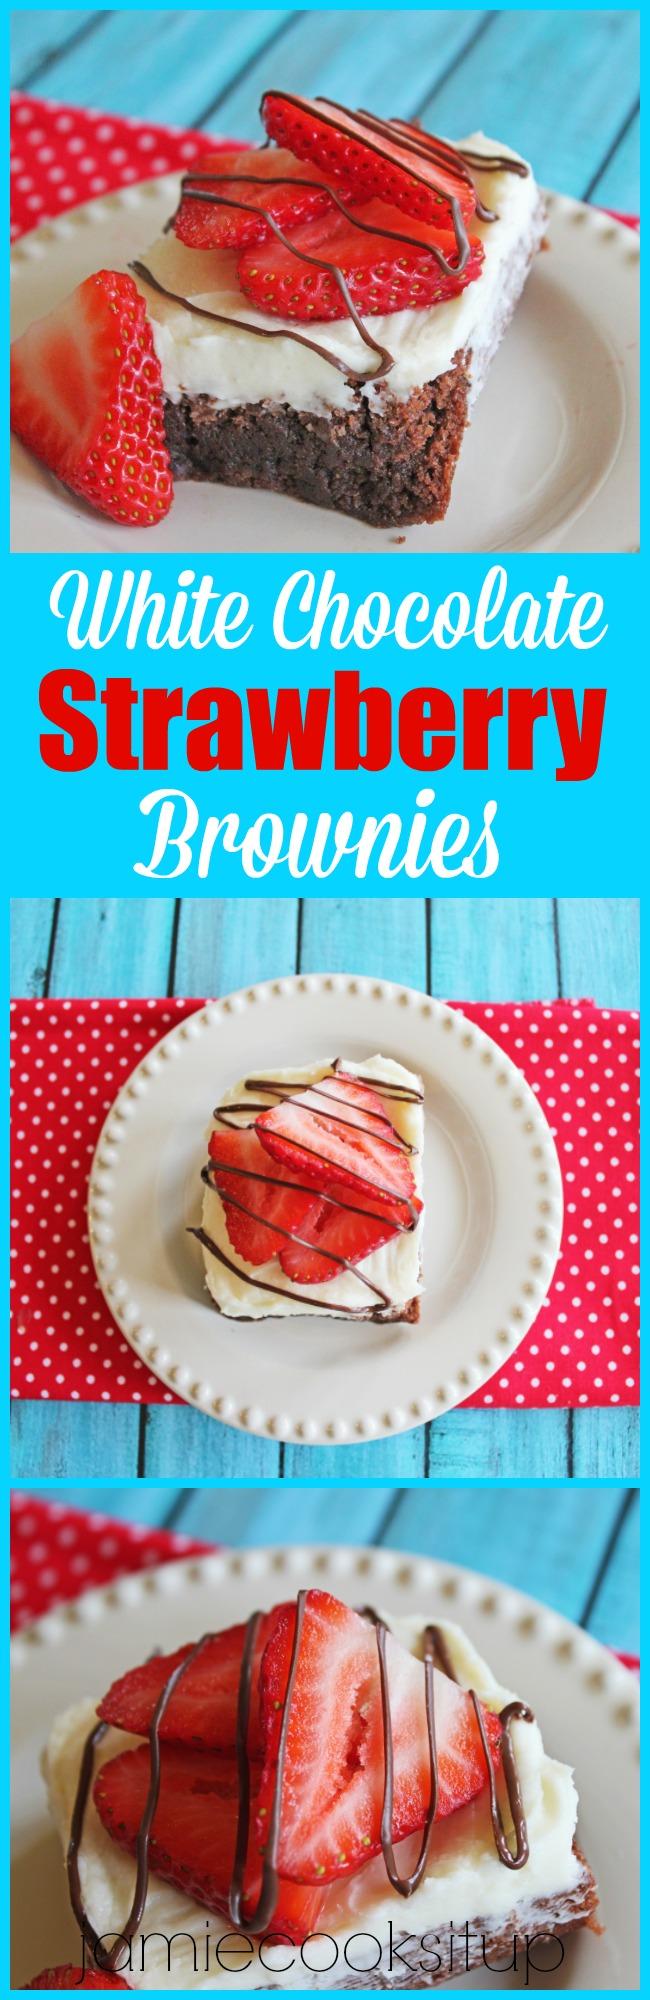 White Chocolate Strawberry Brownies Jamie Cooks It Up!